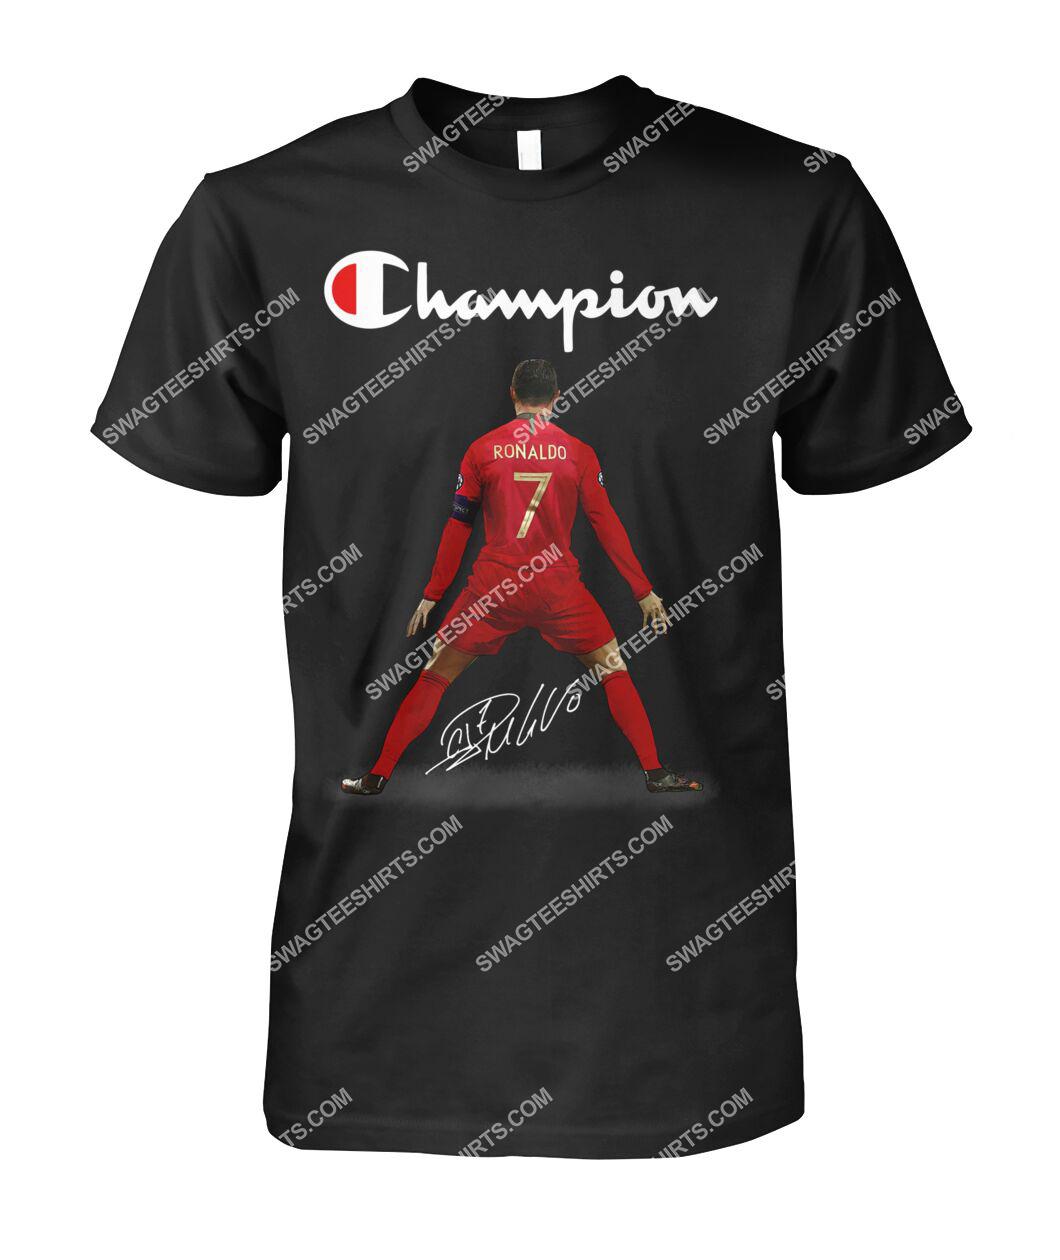 champion cristiano ronaldo signature tshirt 1